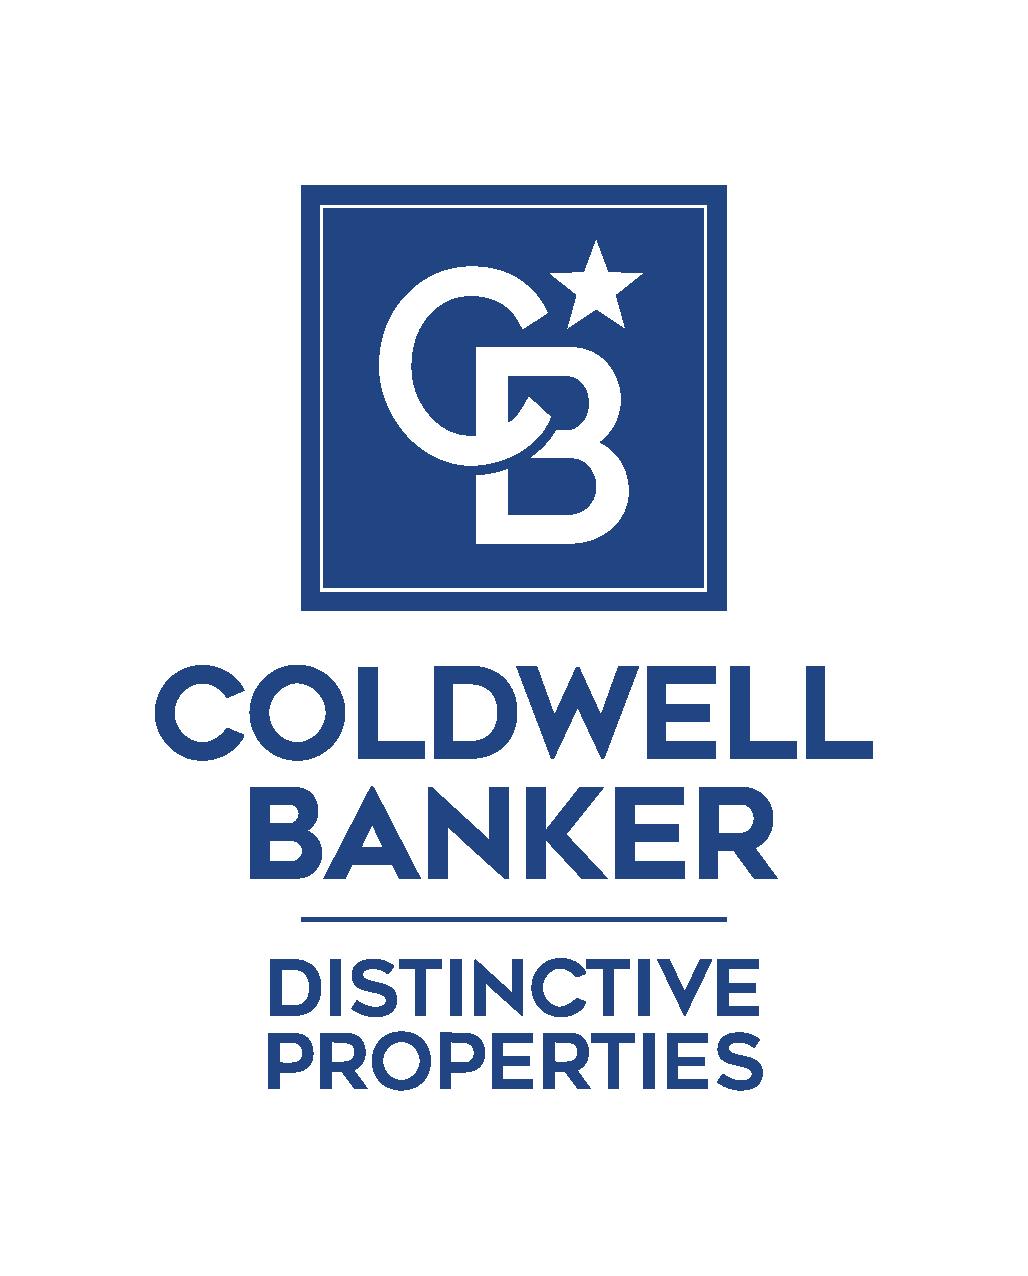 Ken Van Skiver - Coldwell Banker Distinctive Properties Logo